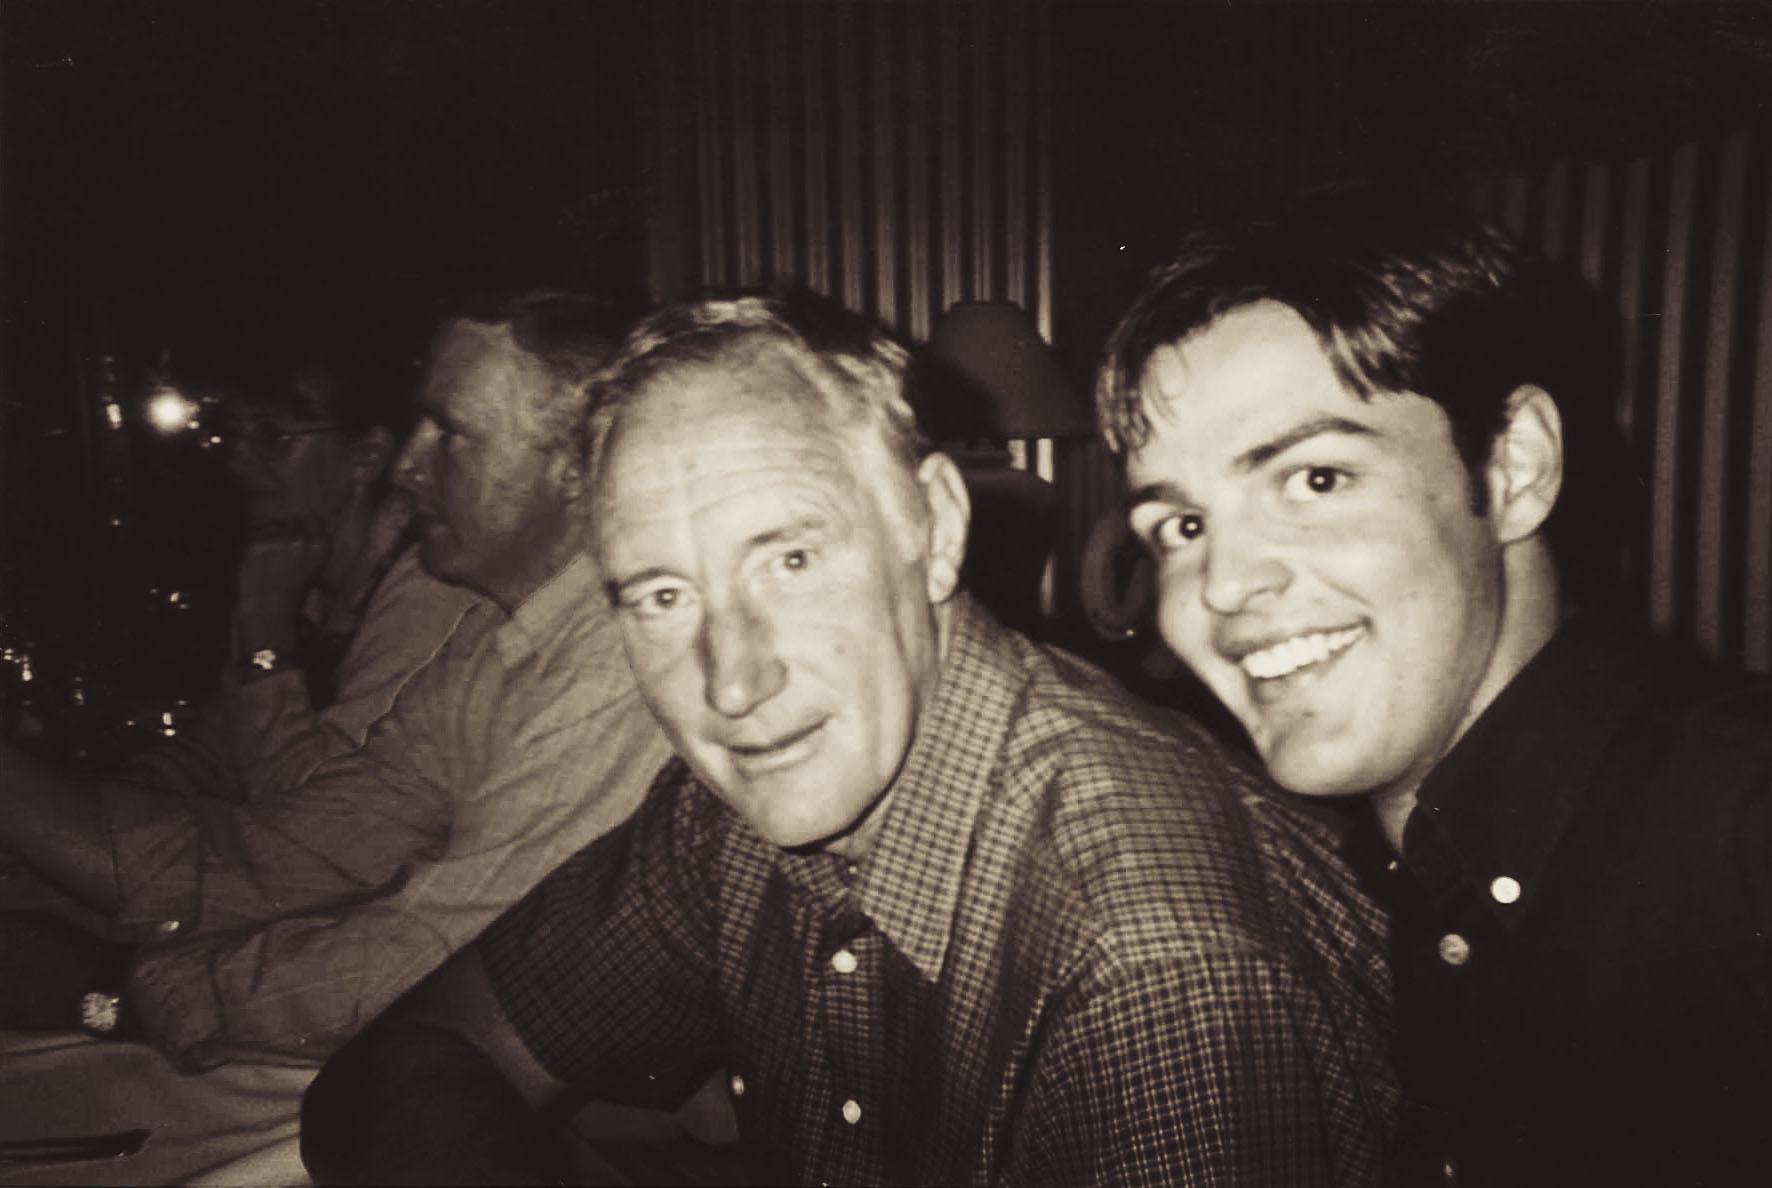 simon-leven-vintage-photo-with-dad